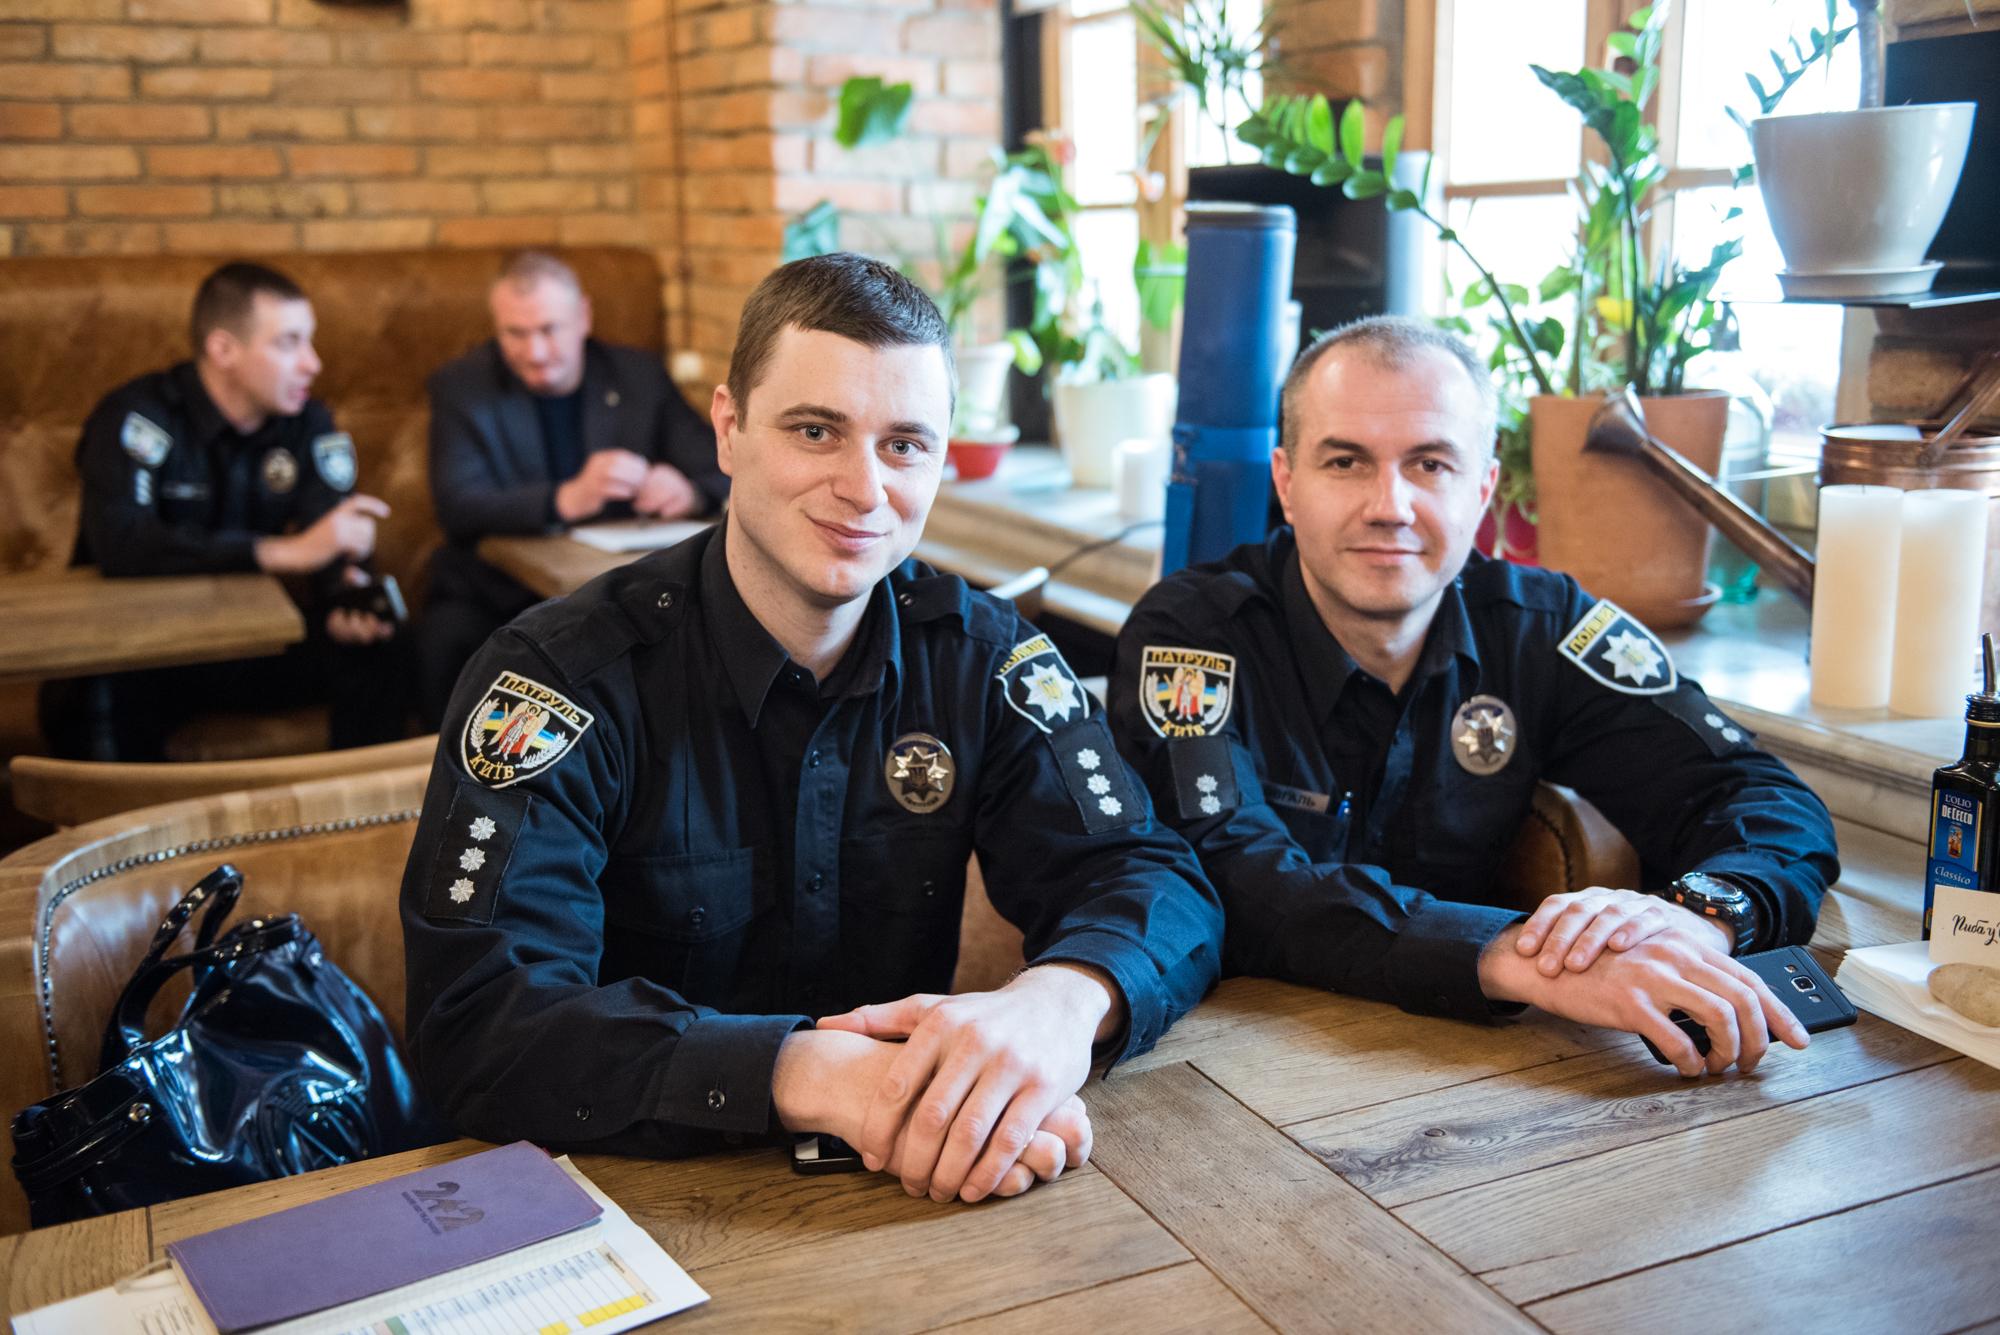 Гарячі поліцейські та самогубство онлайн на СТБ